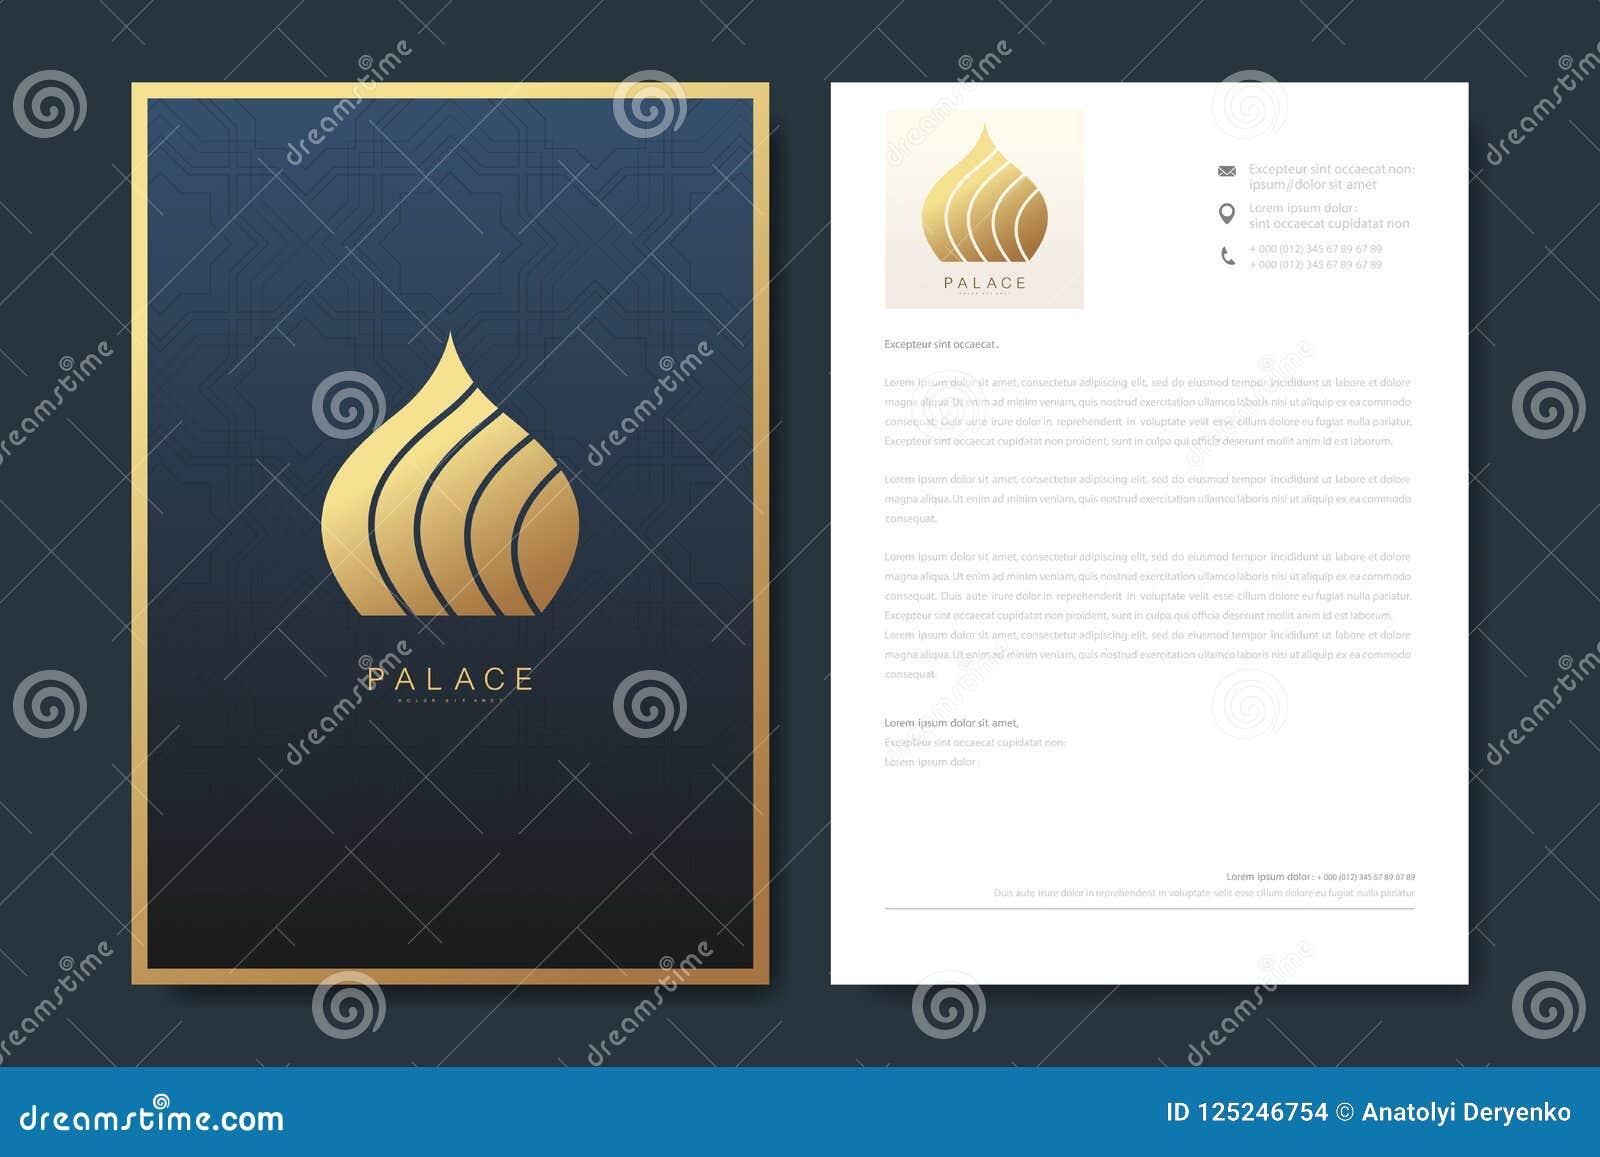 Elegant letterhead template design in minimalist style with logo download elegant letterhead template design in minimalist style with logo golden luxury business design for maxwellsz